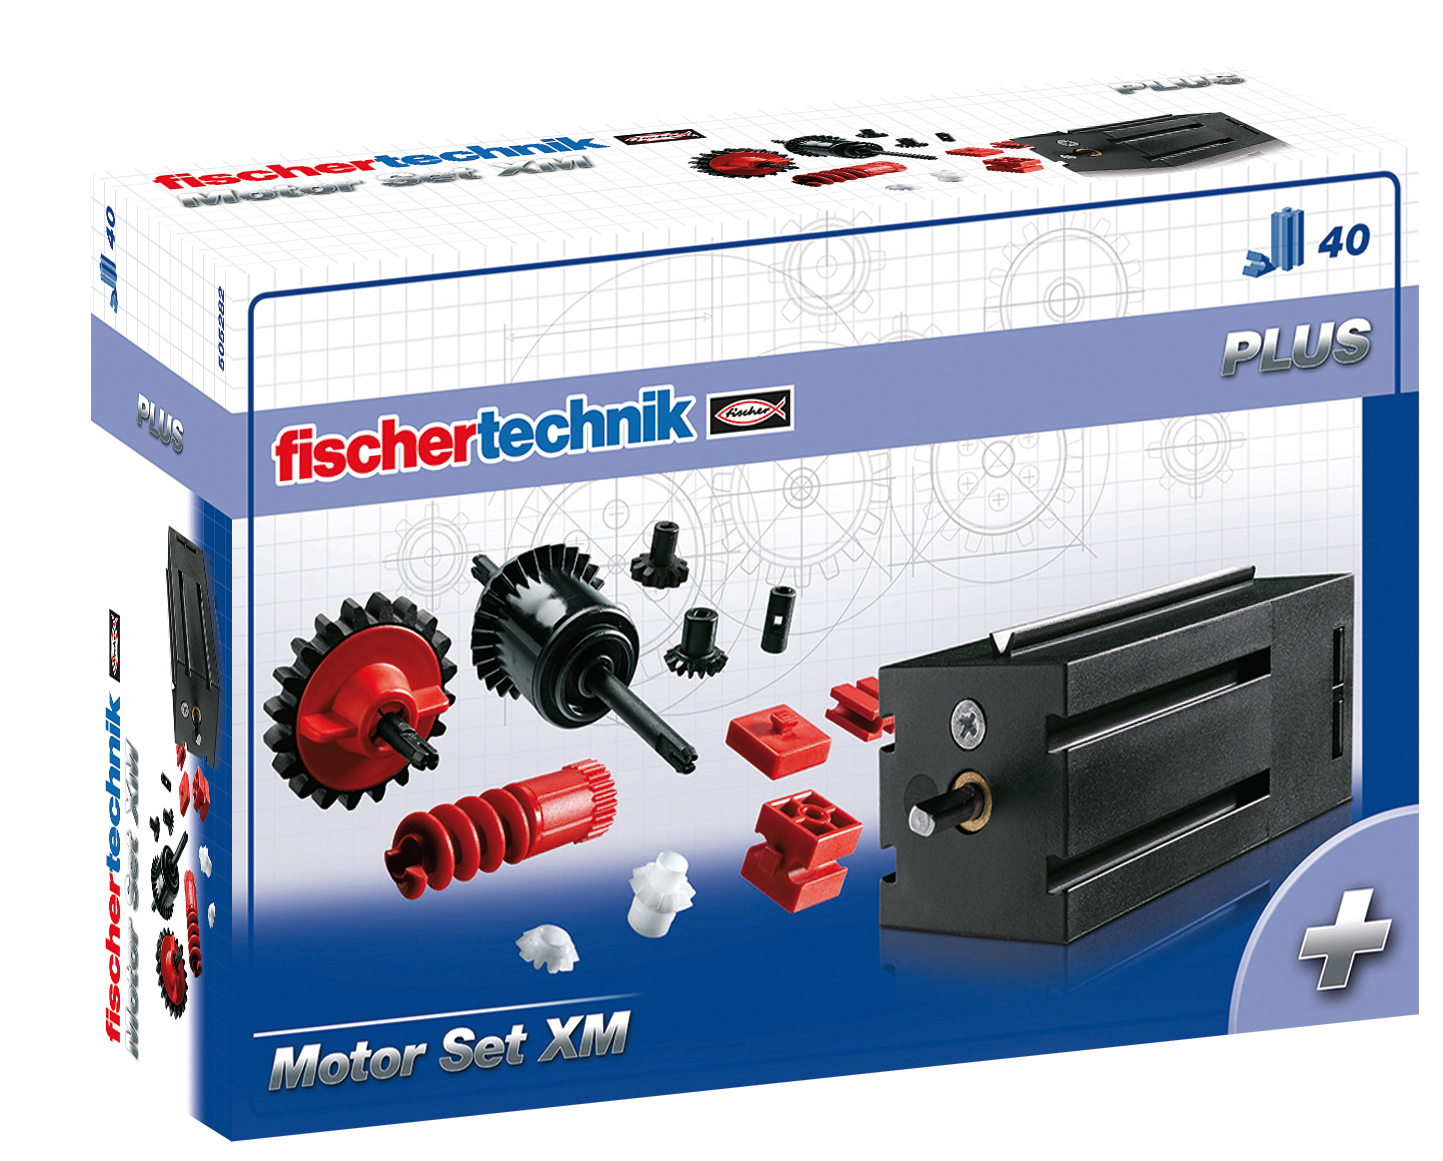 fischertechnik Plus-Motor Set XM Bau- & Konstruktionsspielzeug-Sets